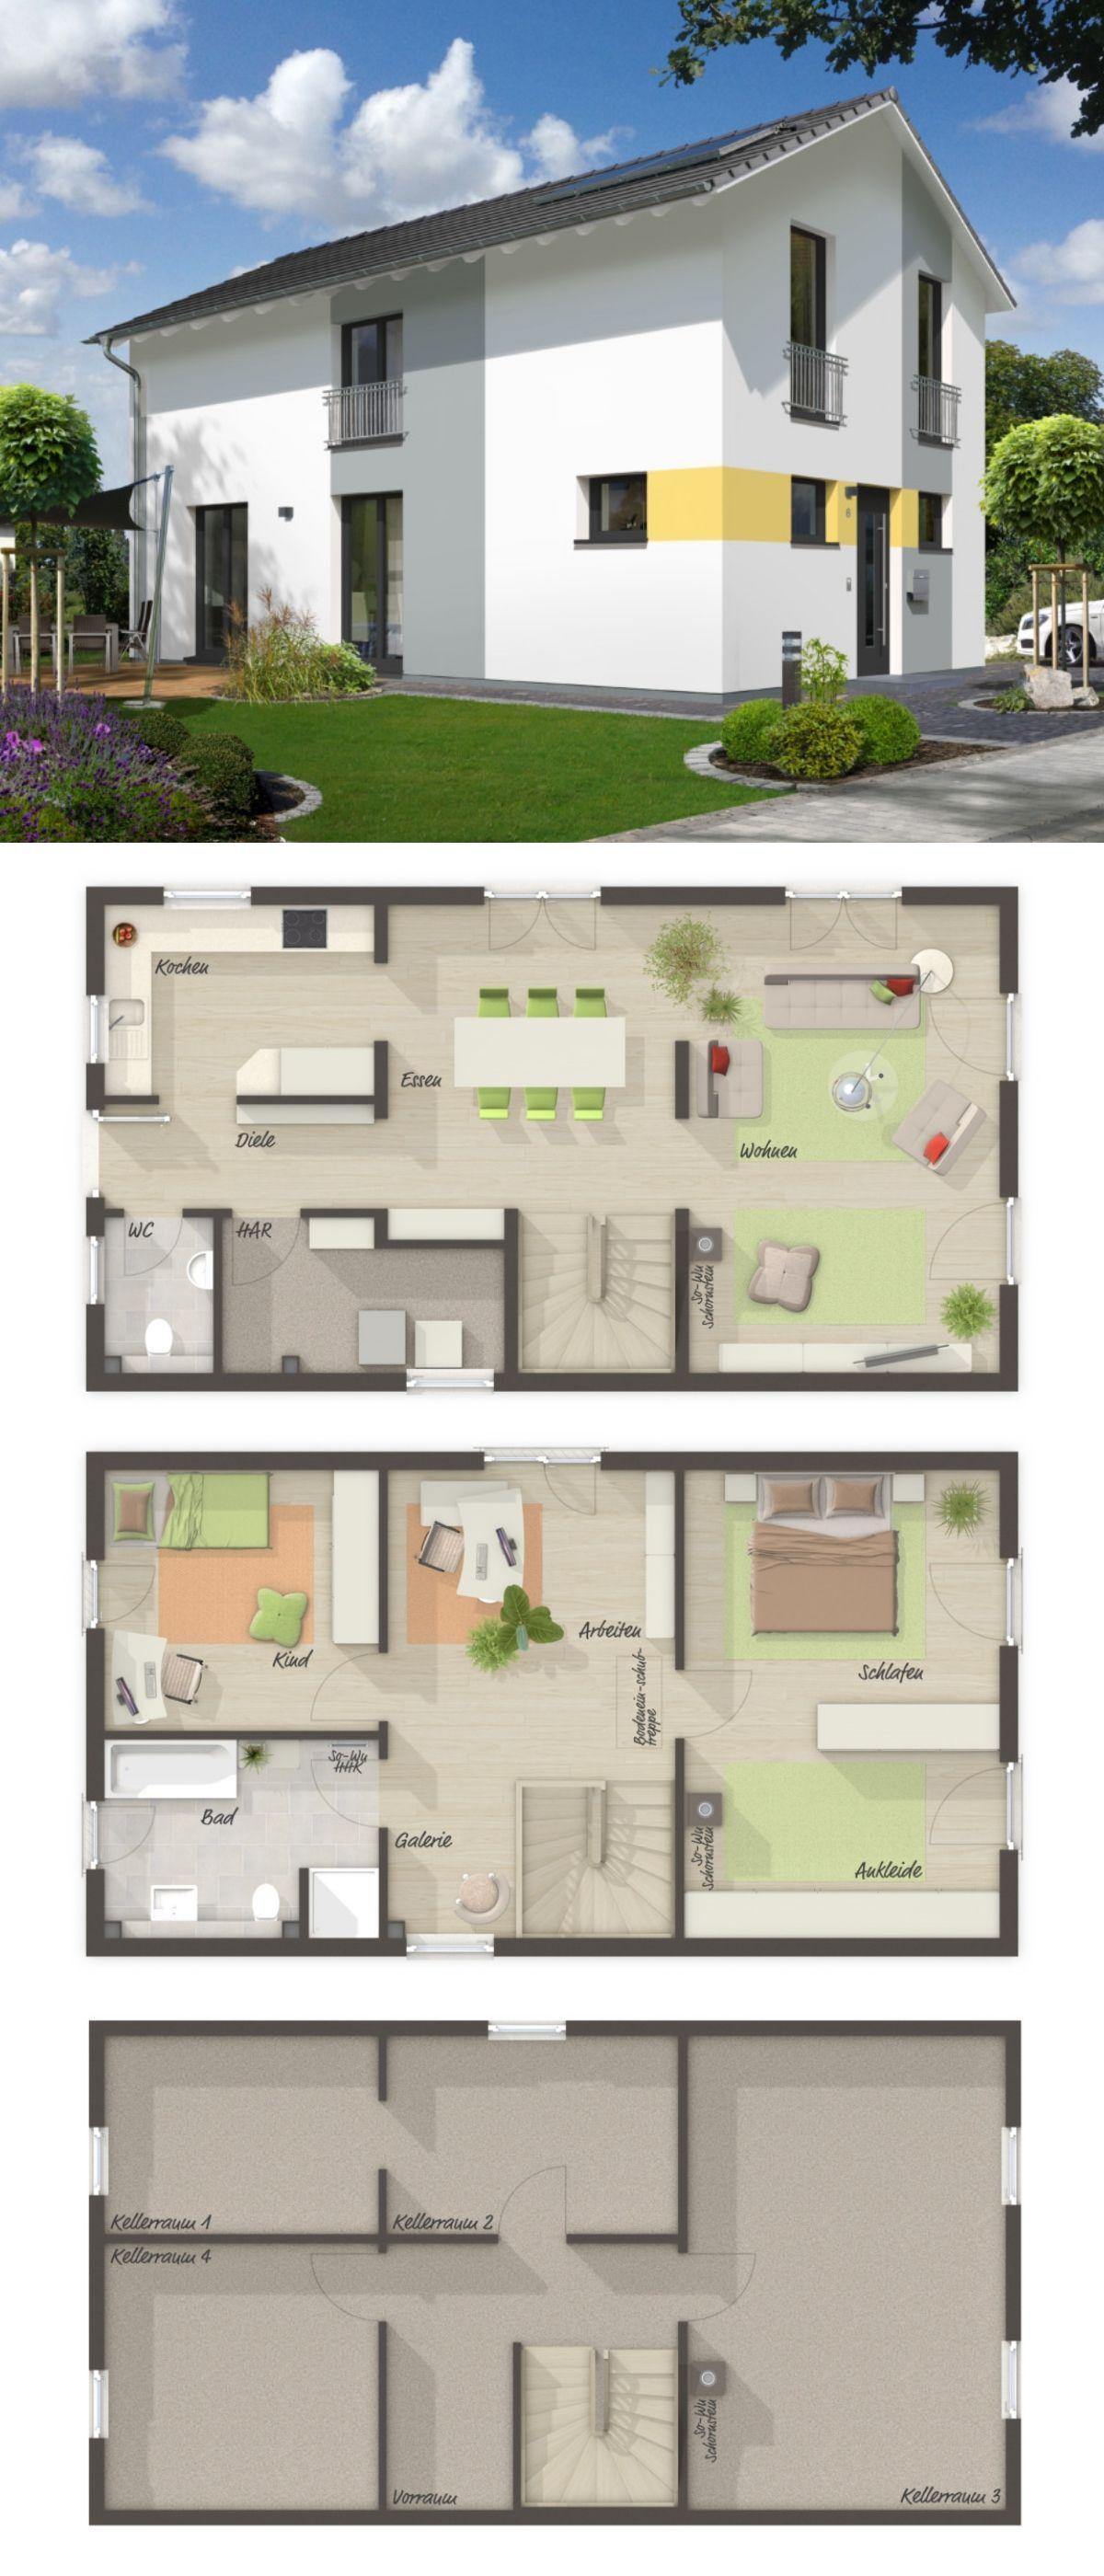 Small House Plans Modern European Style Architecture Design Aura 125 Dream Home Ideas La Grundriss Einfamilienhaus Schmales Haus Grundrisse Town Country Haus